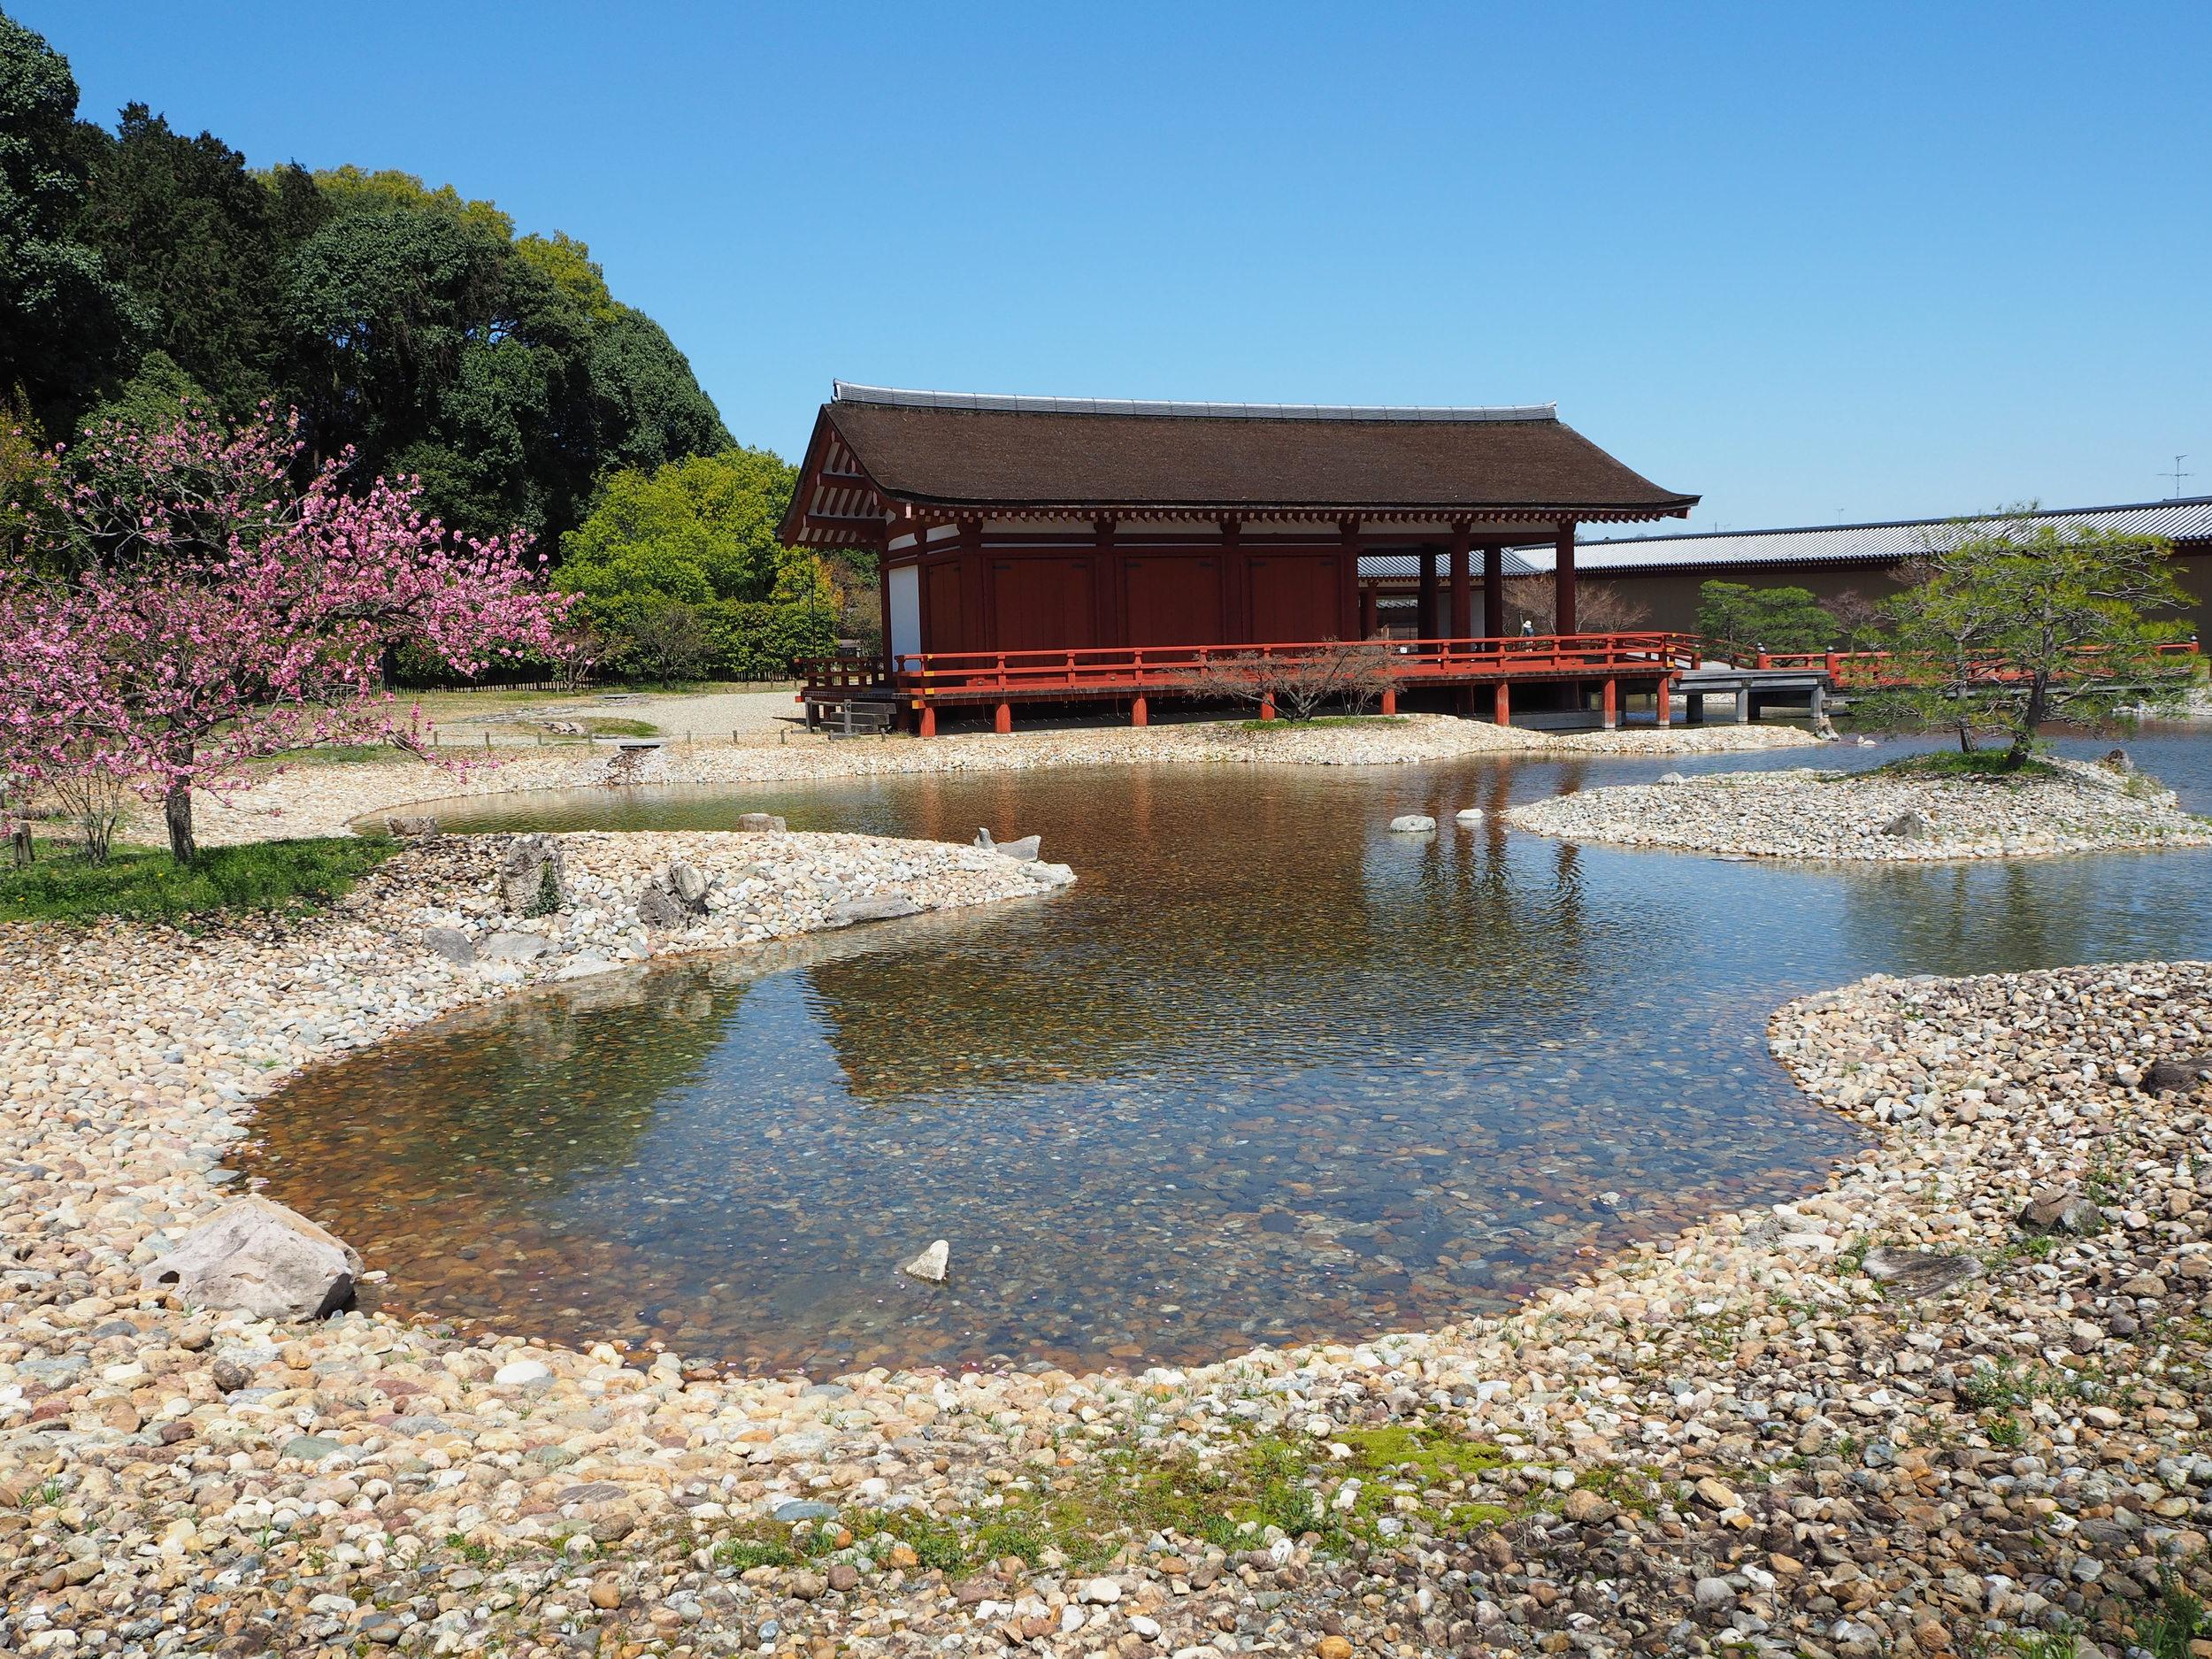 The ancient garden of Heijokyo at Nara, made in 564AD